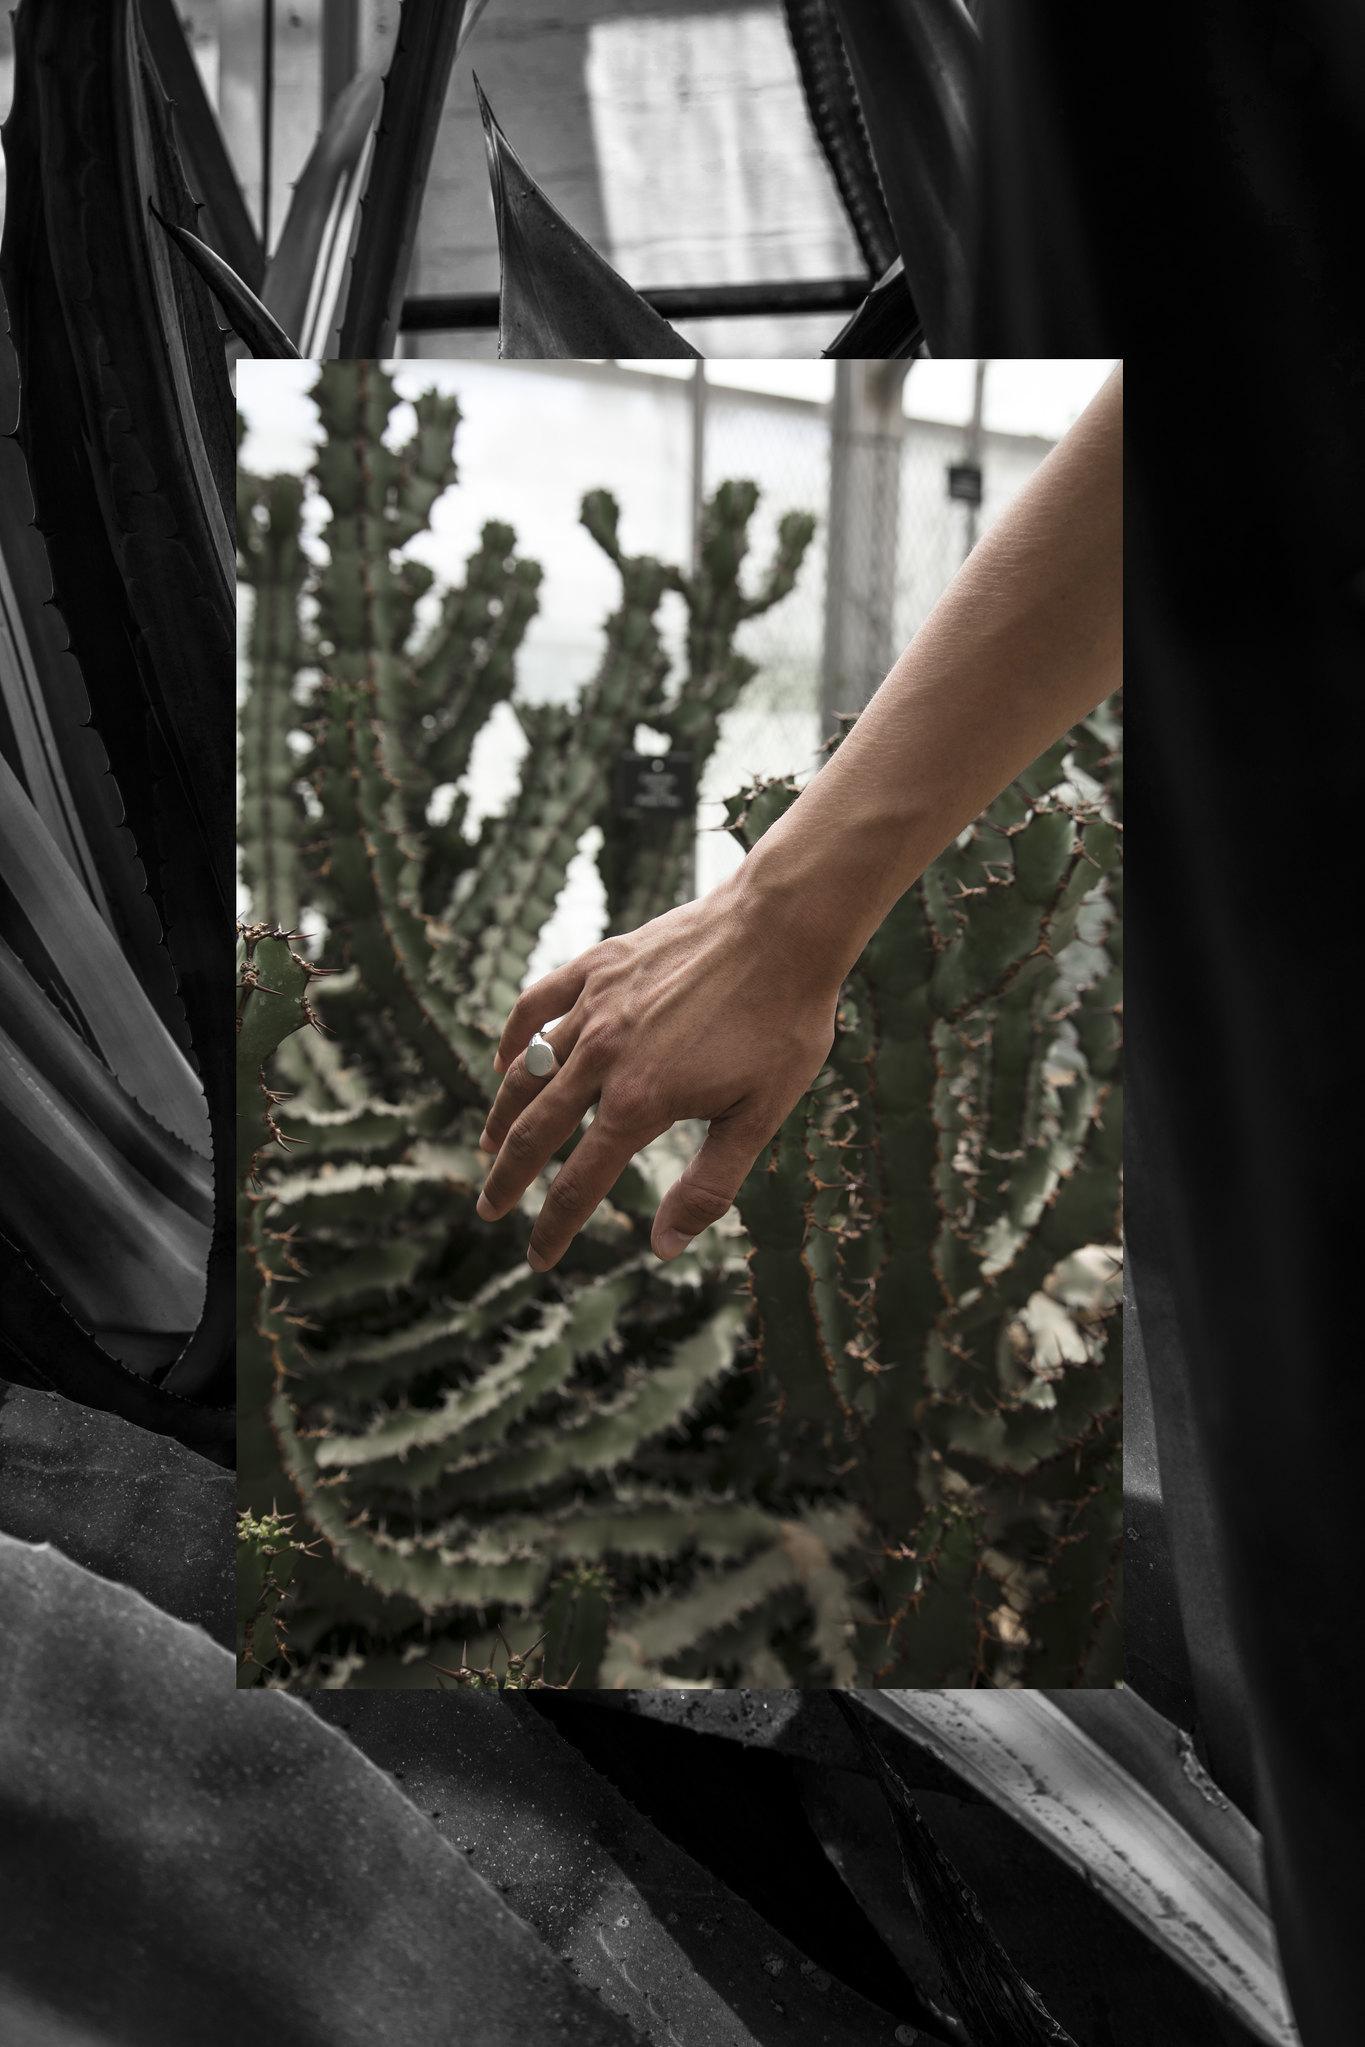 Jordan_Bunker_botanical_gardens_4